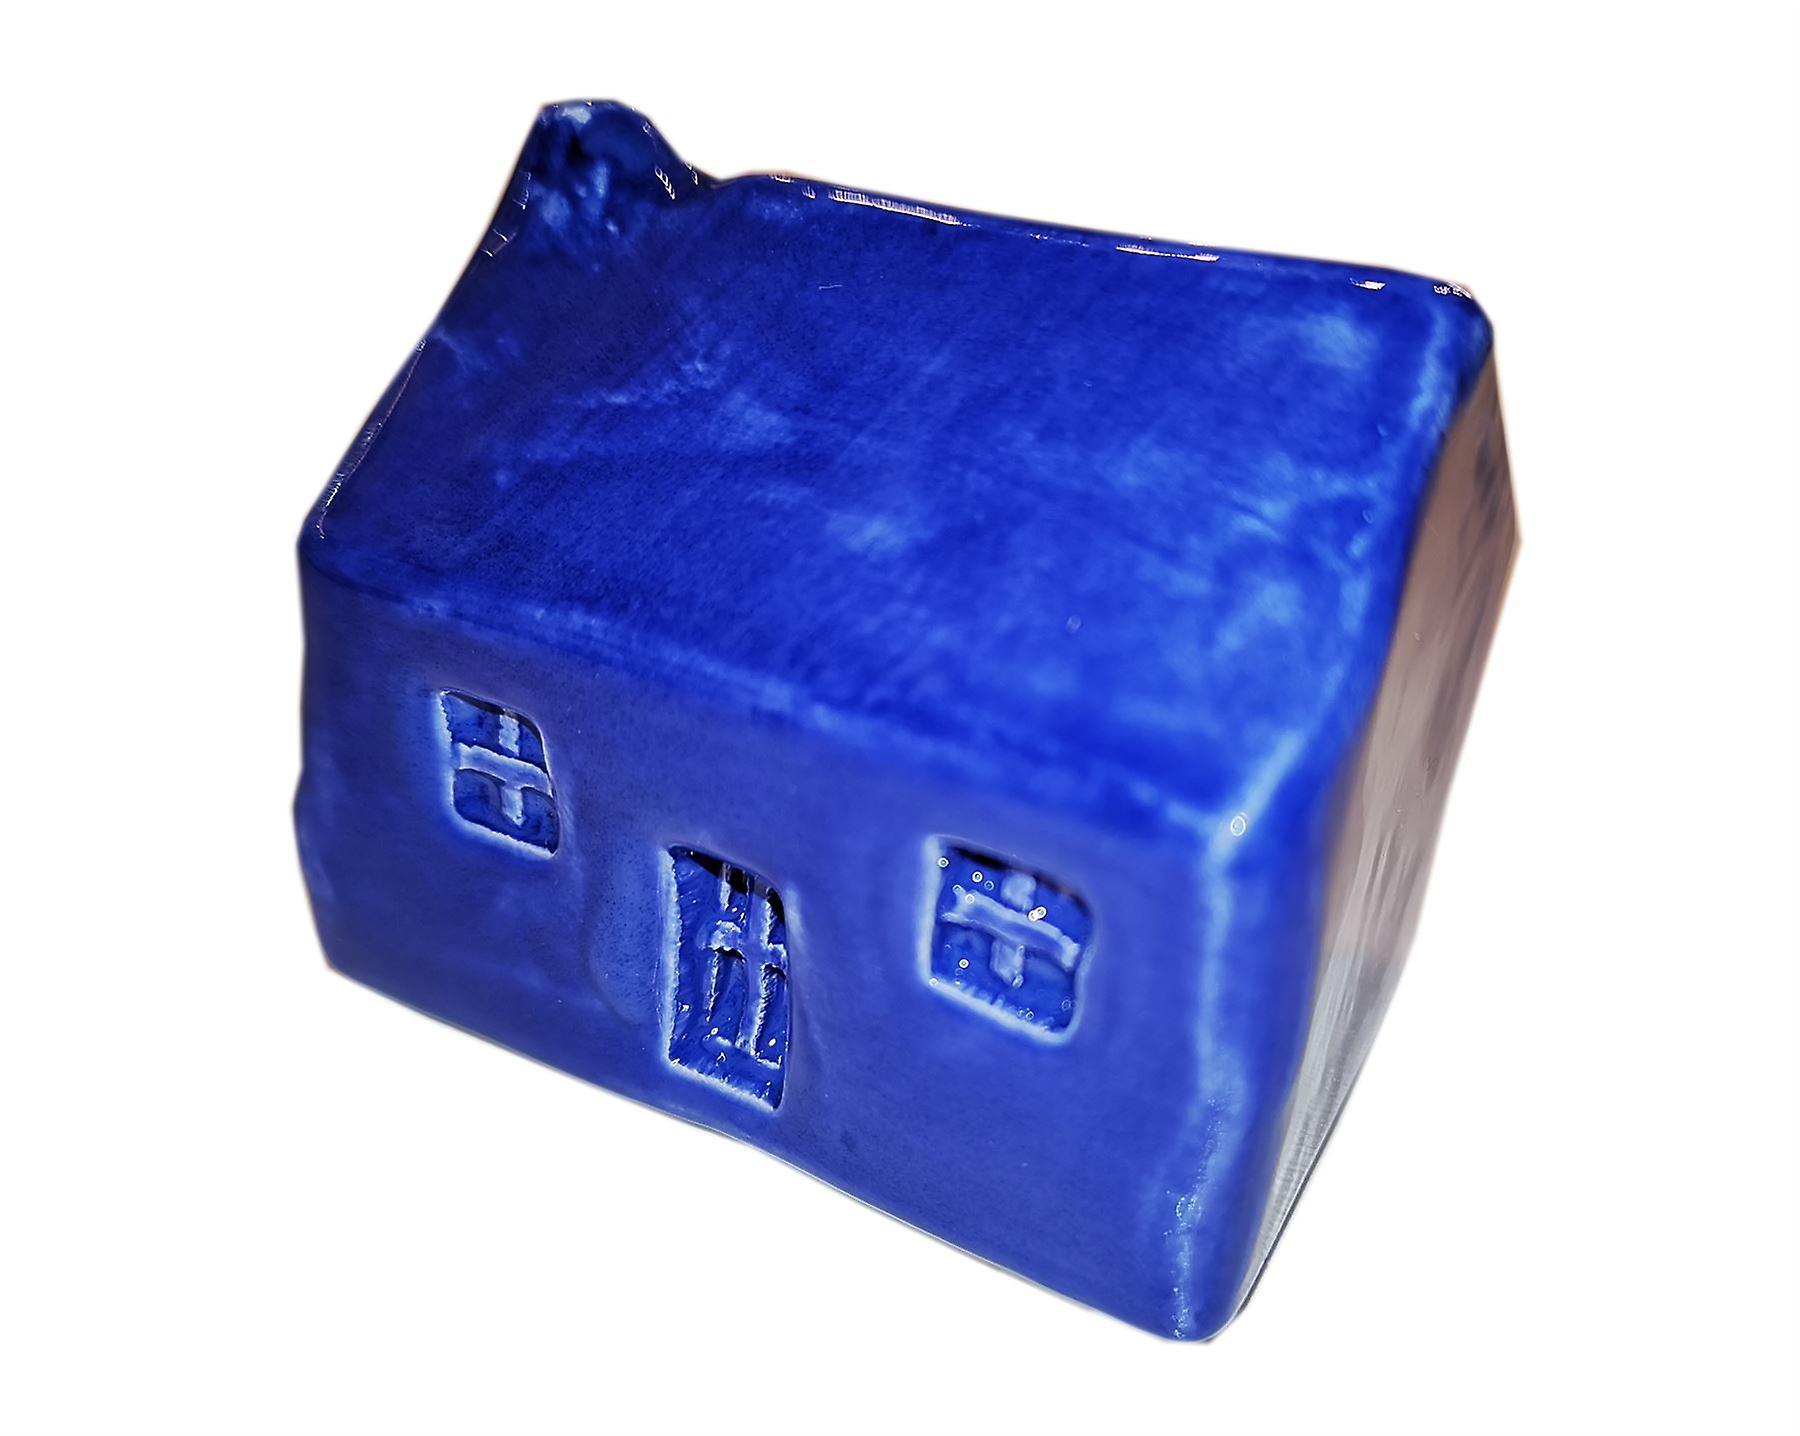 Glenshee Pottery Original Wee Highland Bothy Navy Blue